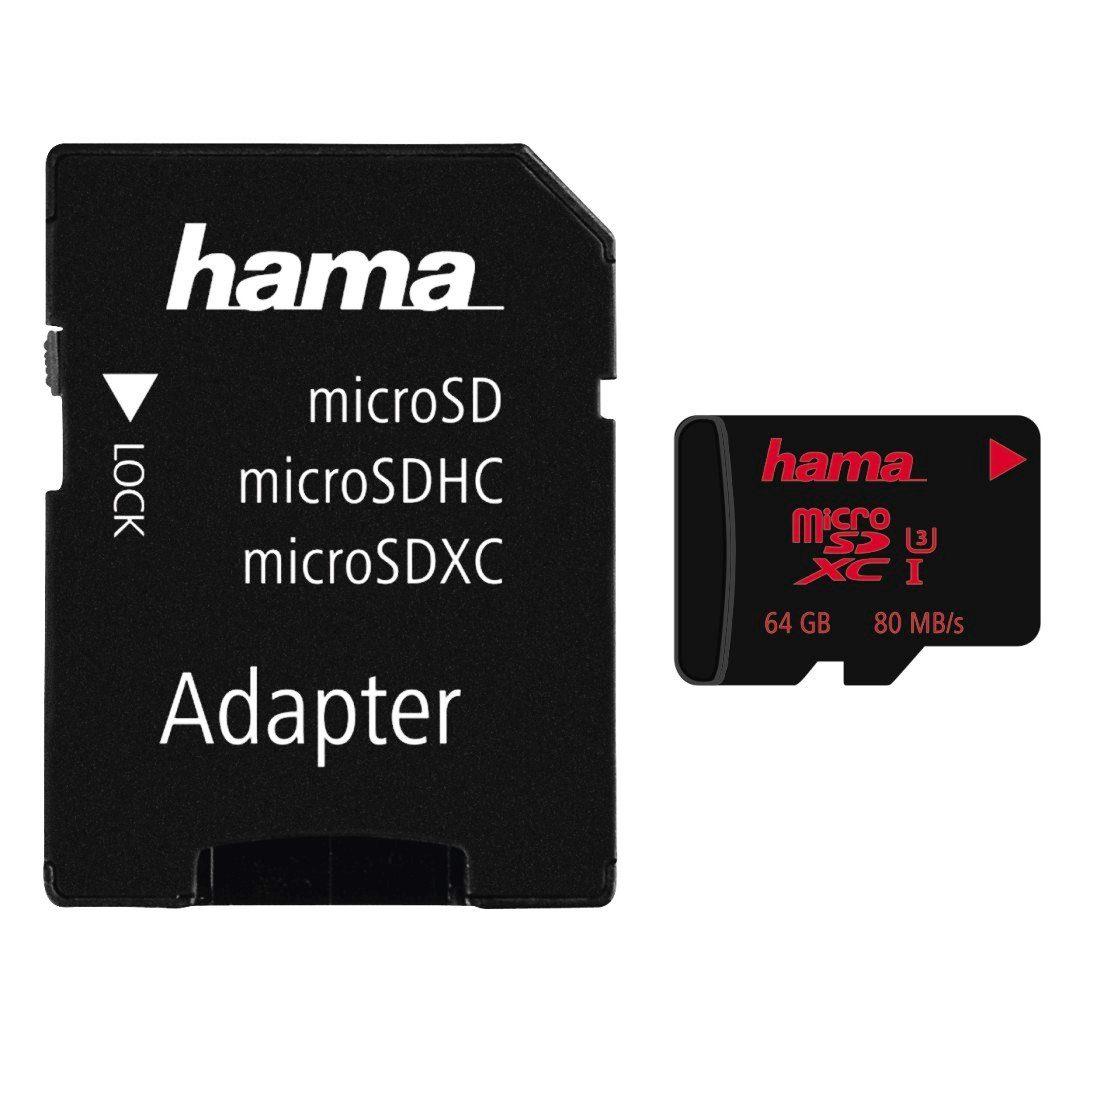 Hama MicroSDXC 64 GB UHS Speed Class 3 UHS-I 80 MB/s »Speicherkarte + Adapter/Mobile«